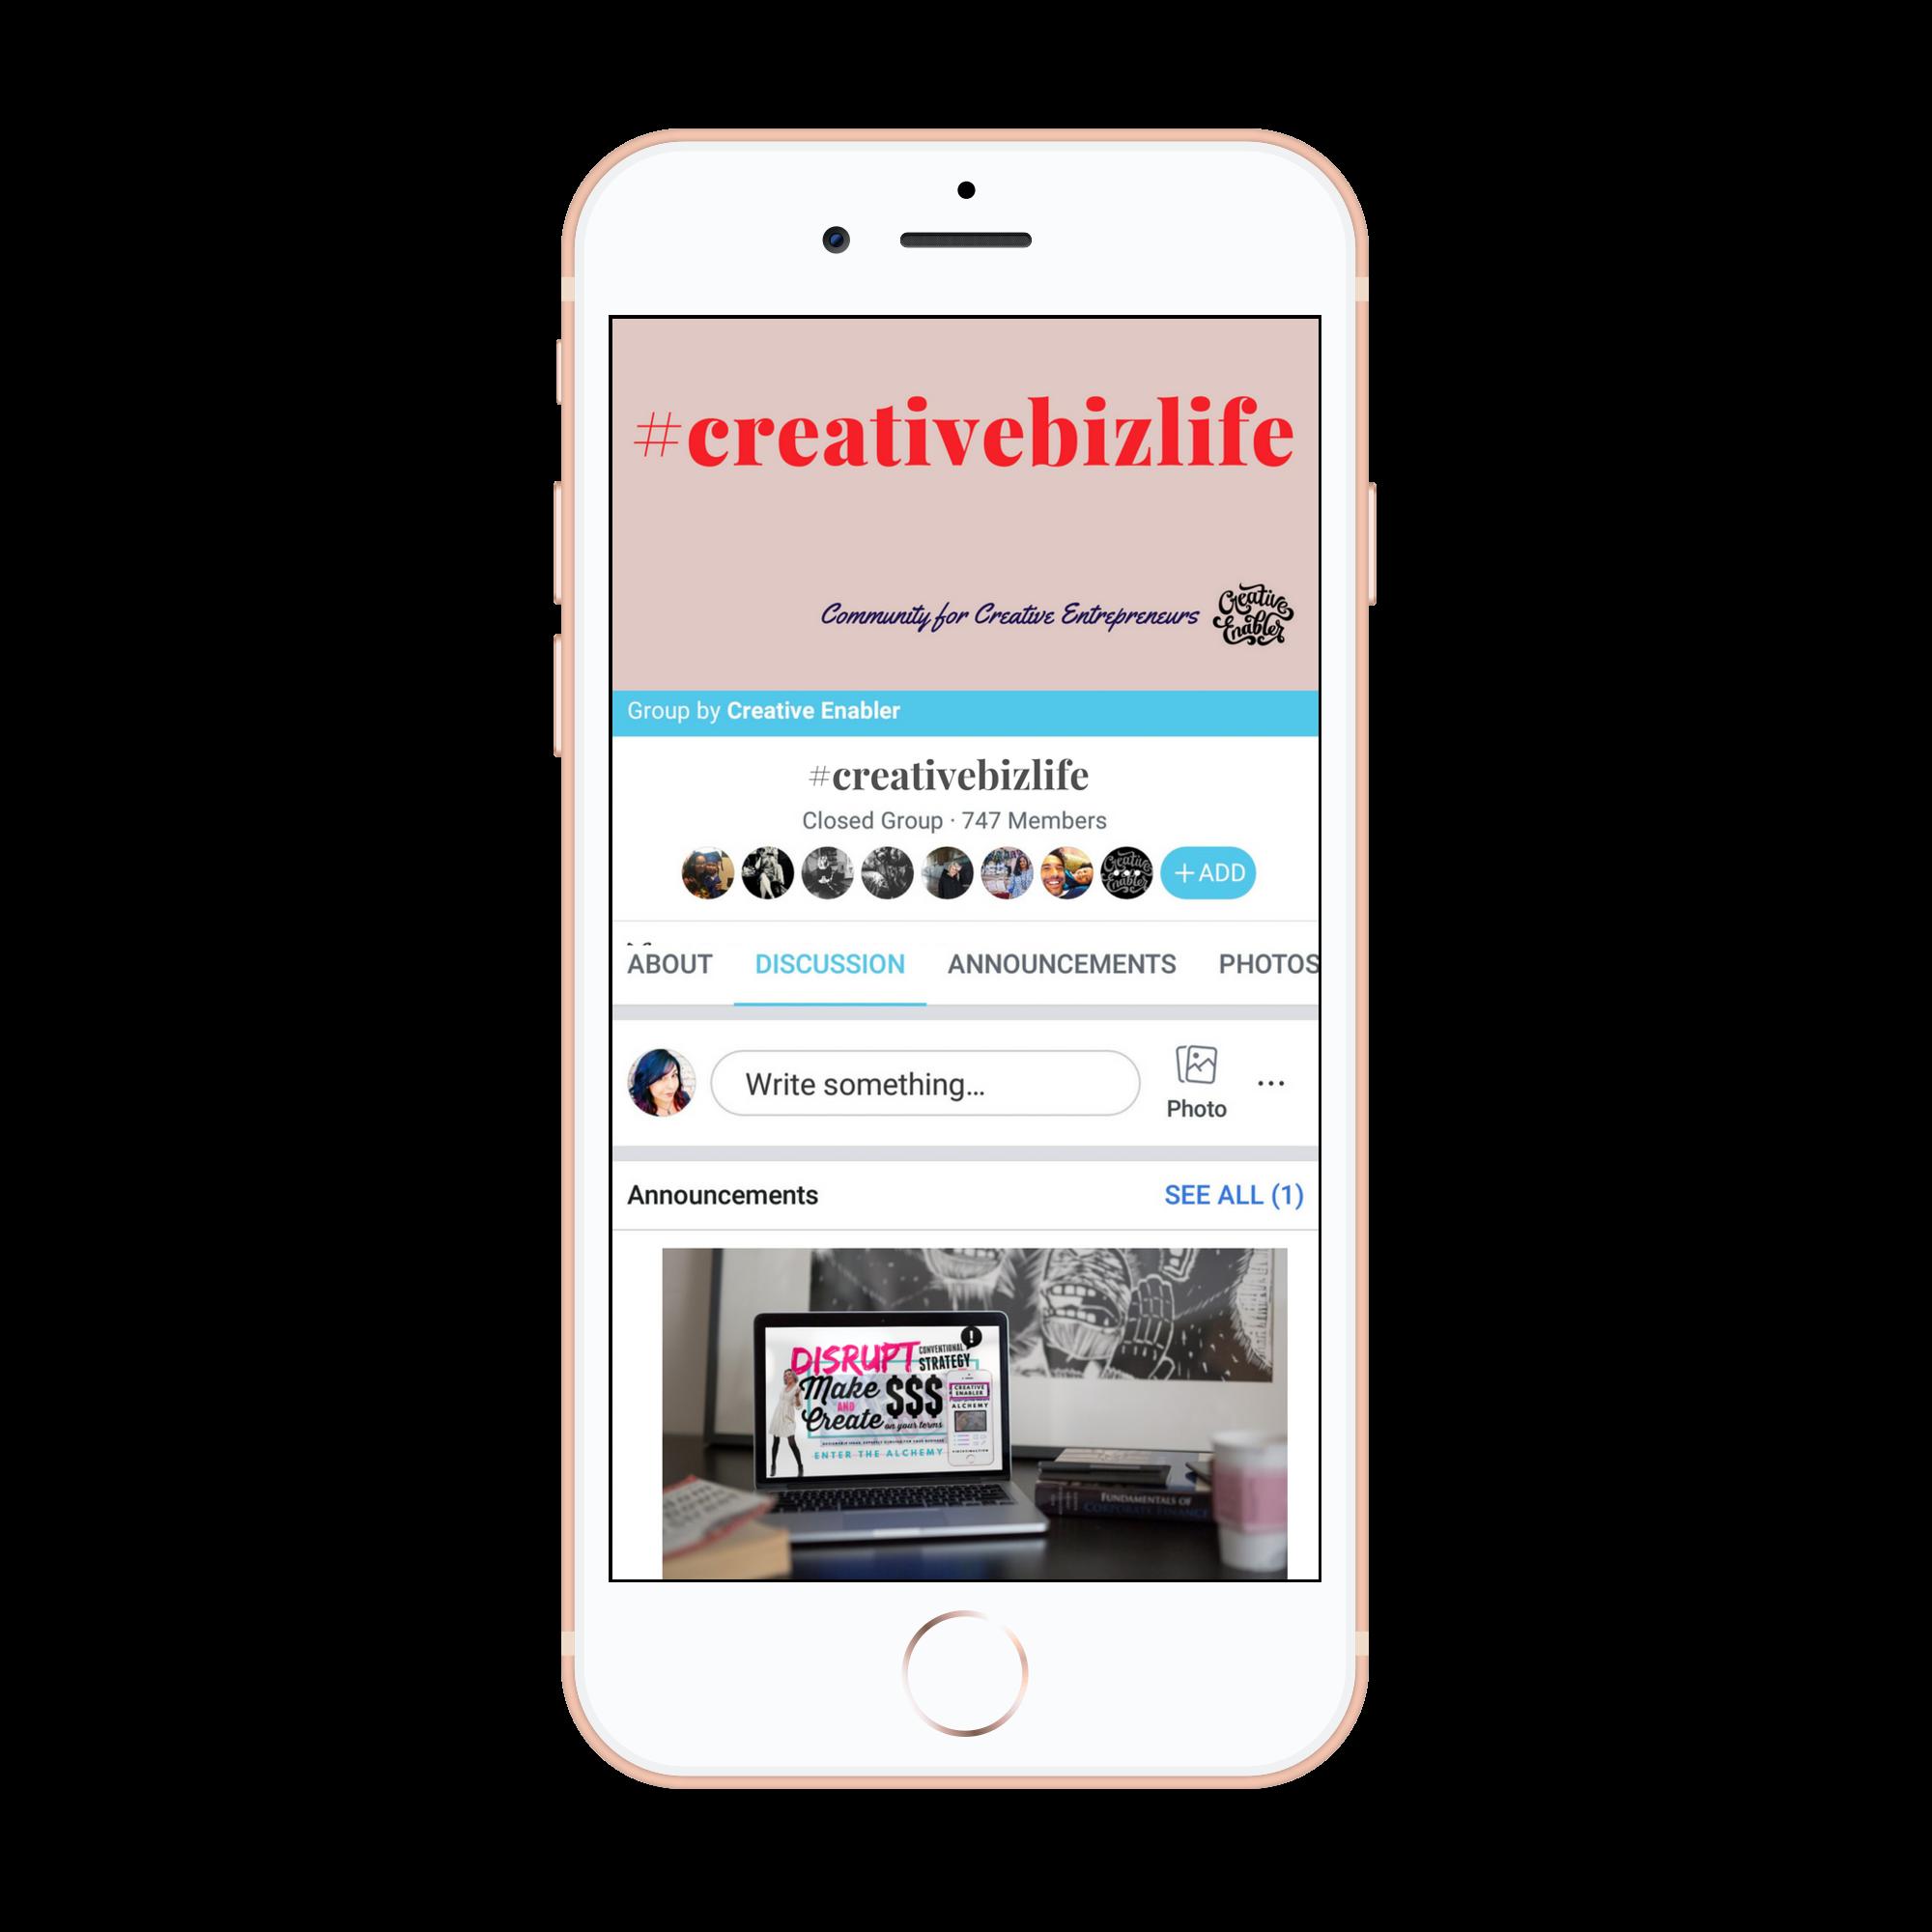 #creativebizlife